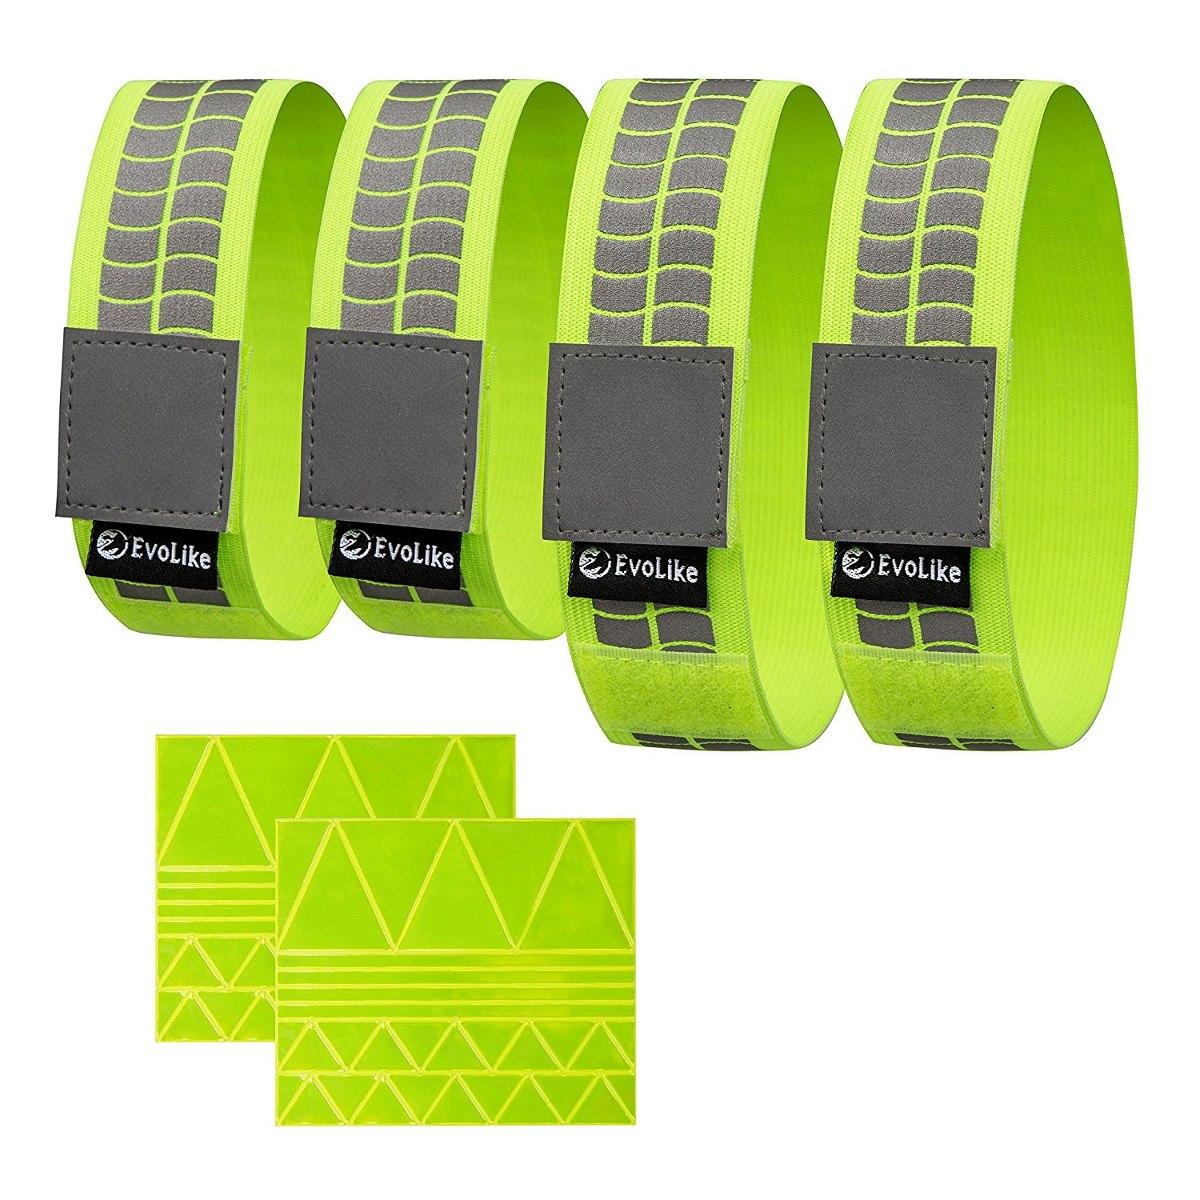 0c61f7a4c791 evolike premium pulseras reflectantes brazaletes para cin... Cargando zoom.